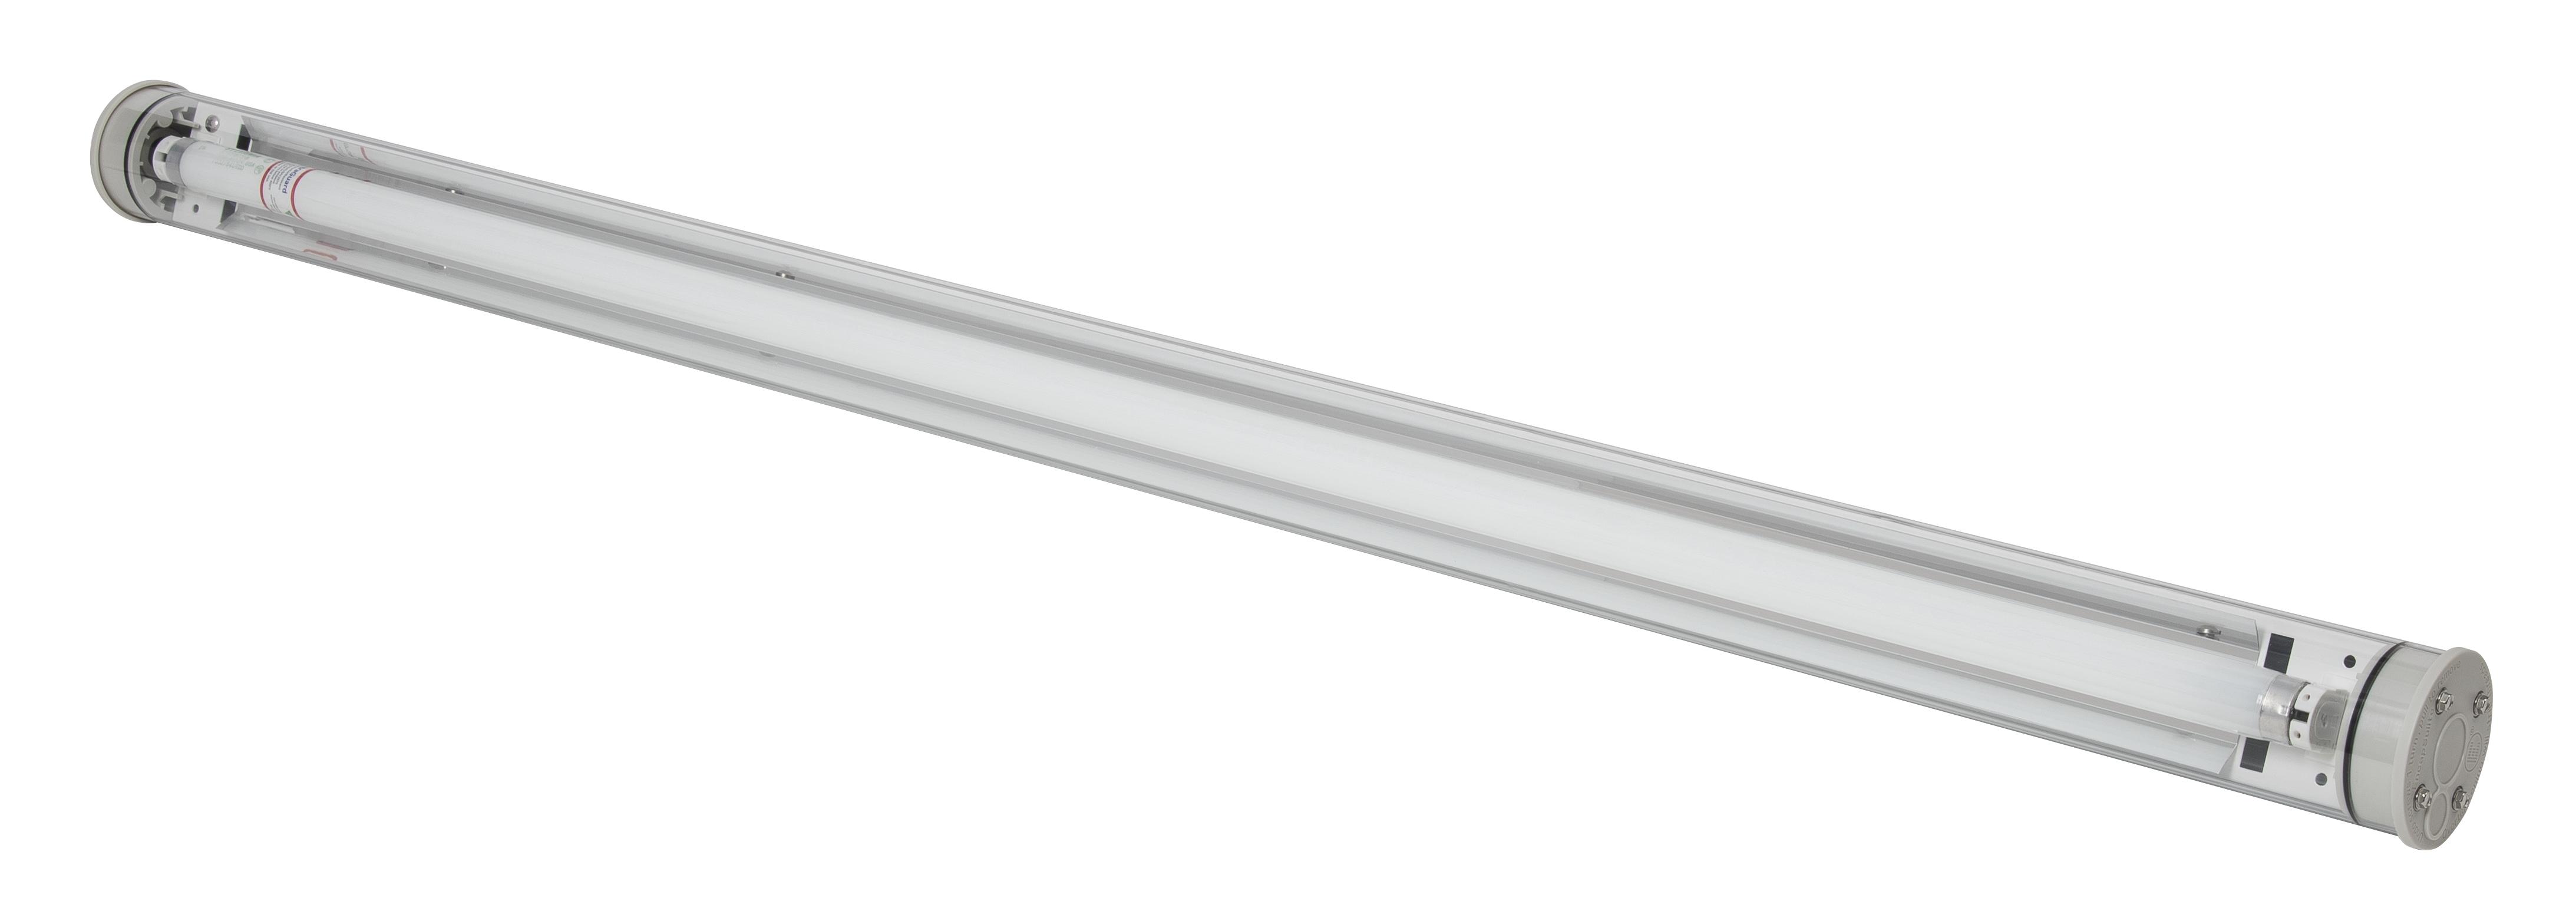 WaterGuard Waterproof LED Fixtures | WaterGuard LED Lighting